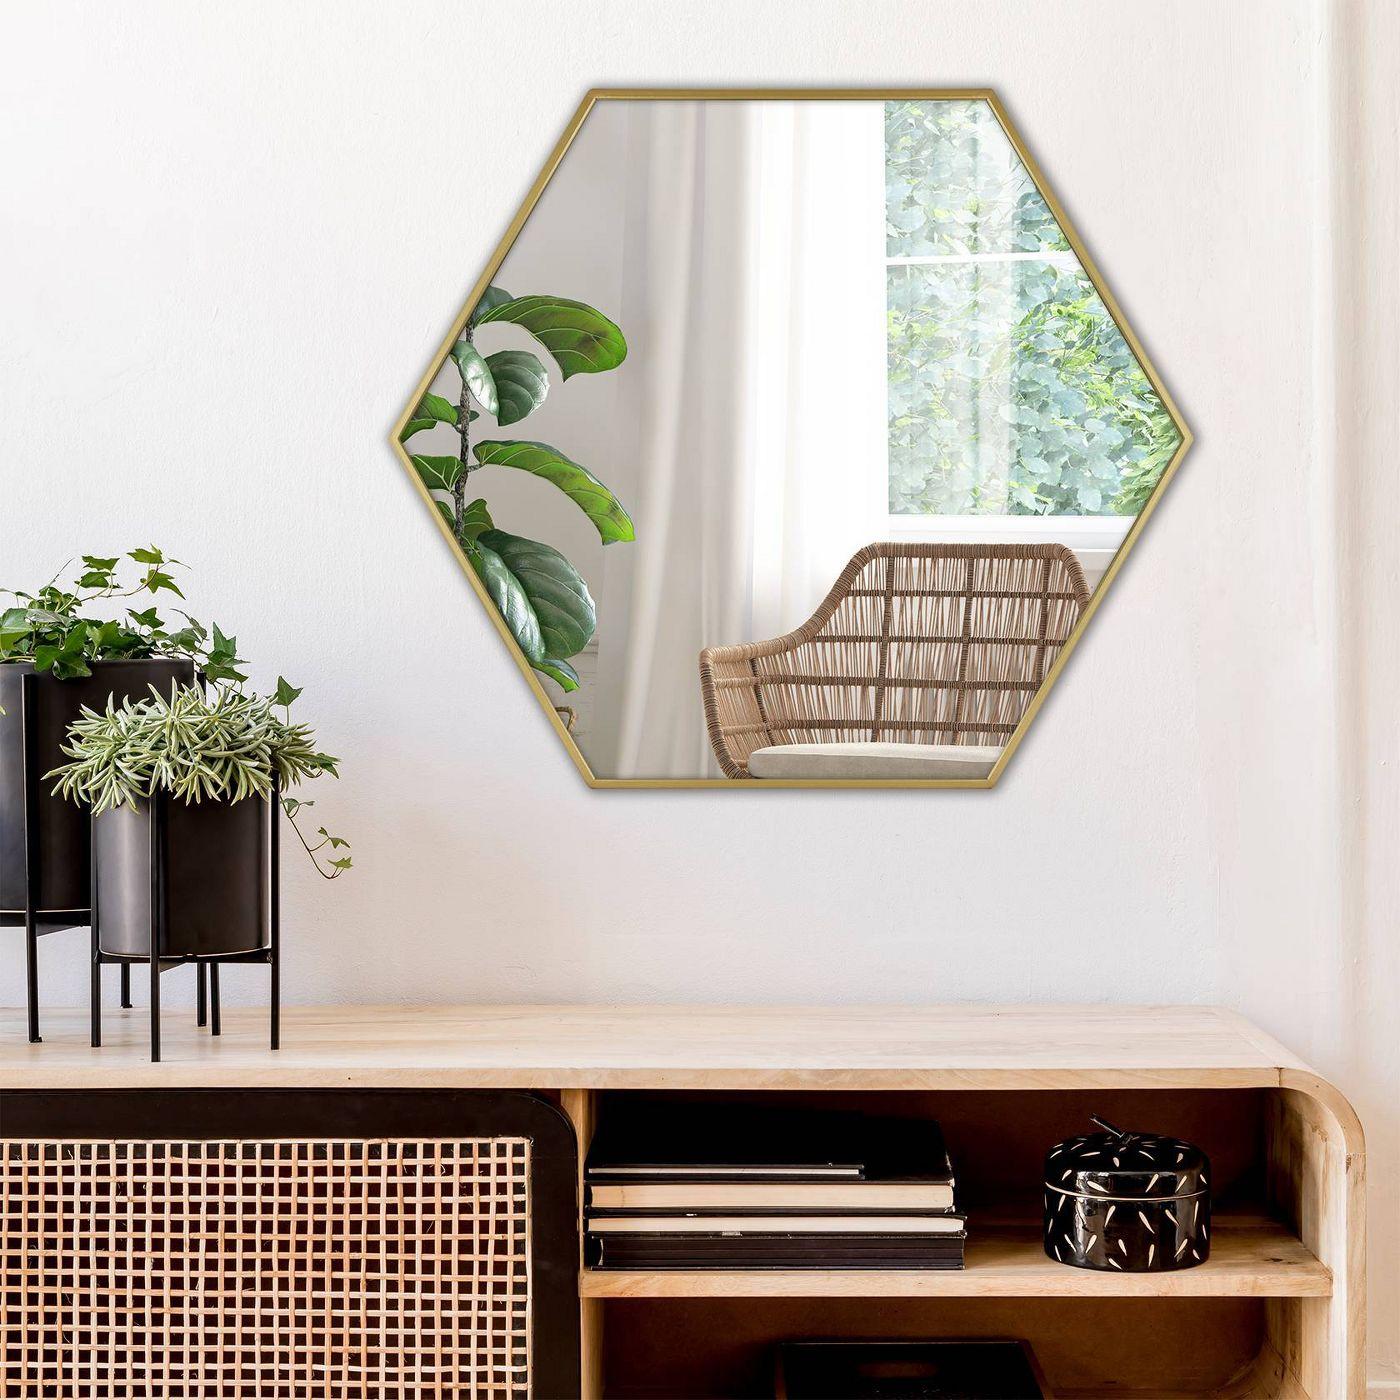 Hexagonal geometric mirror